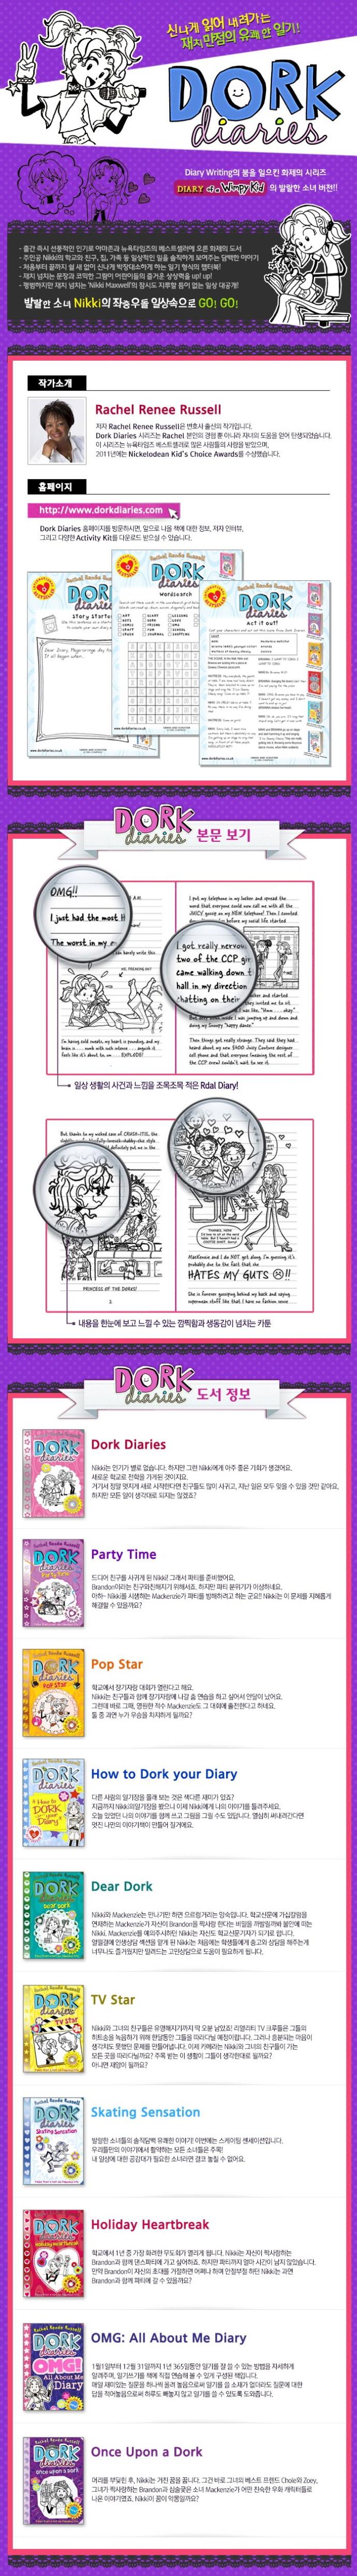 Dork Diaries 10 Books Slipcase Edition : 도크 다이어리 10권 박스 세트 (영국판) 도서 상세이미지